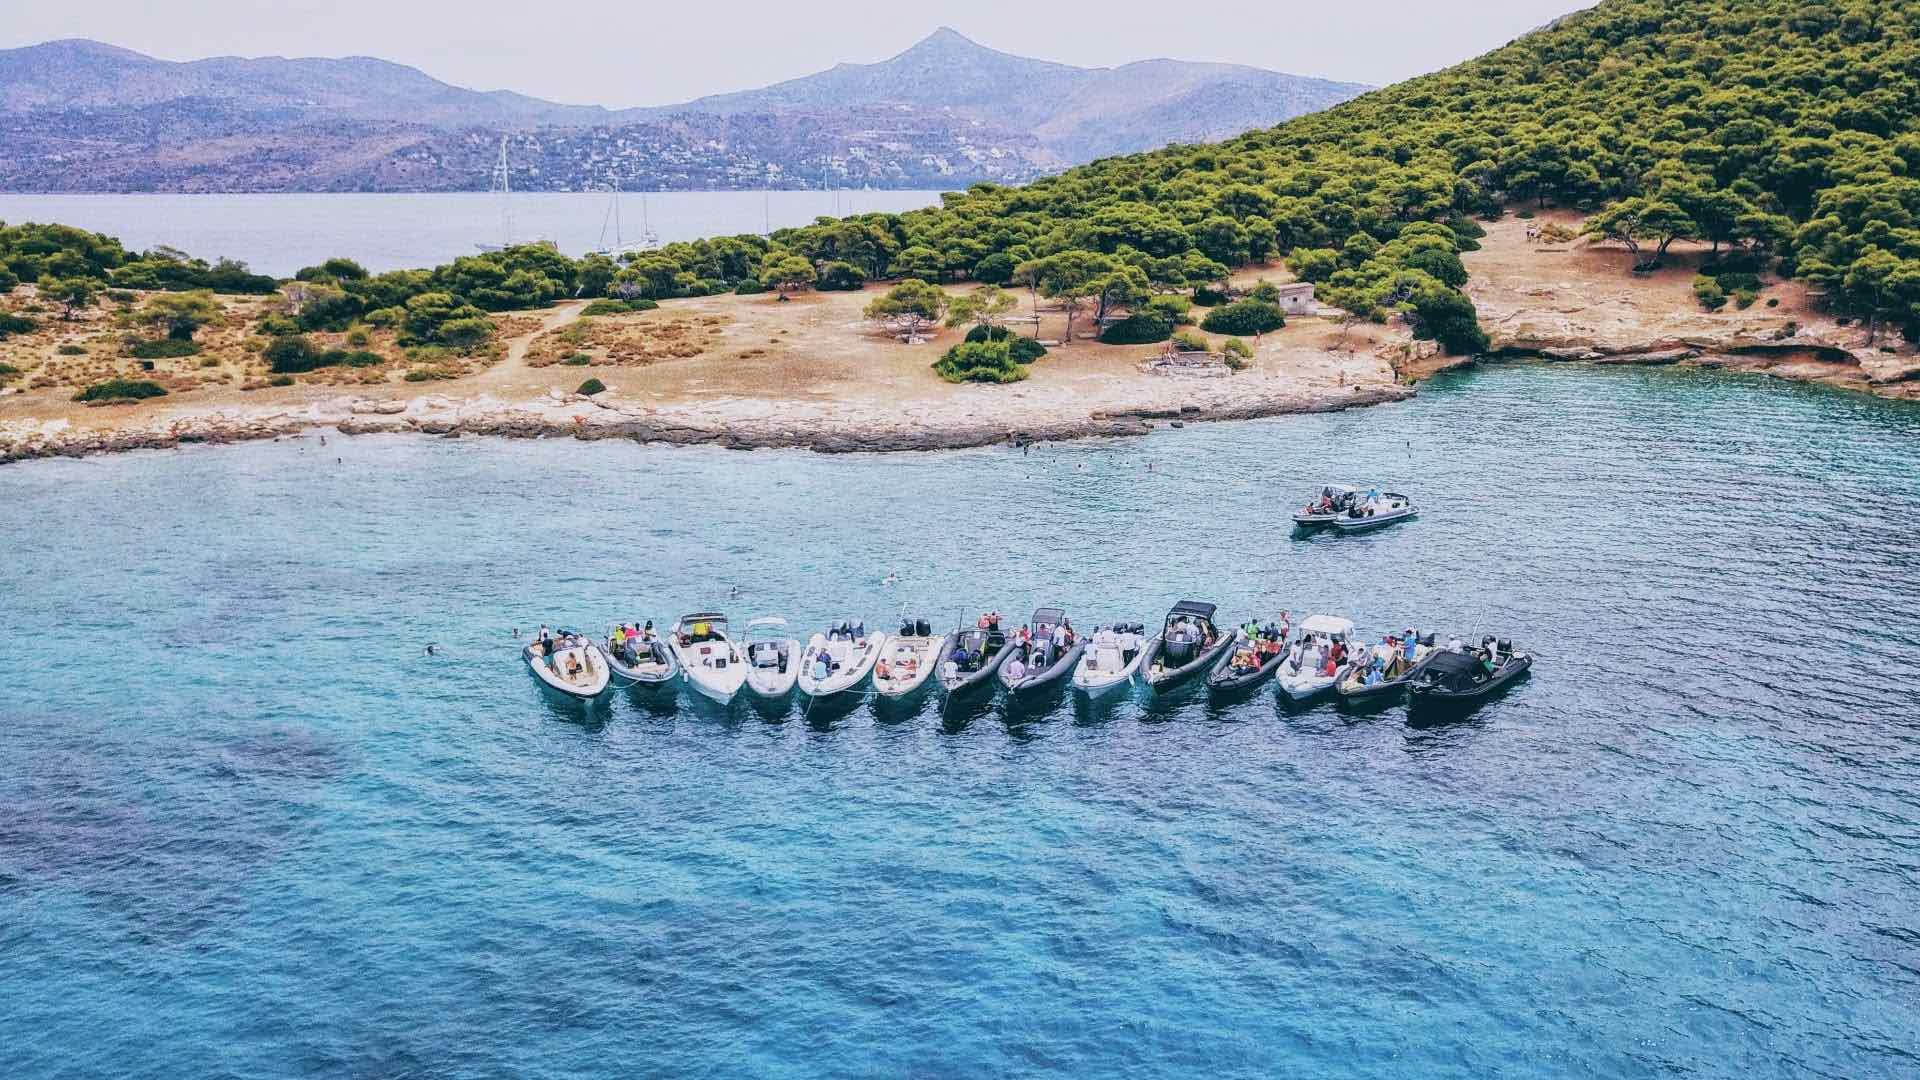 DB (8 hours): [Athens] Athens - Aegina Island - Moni Islet